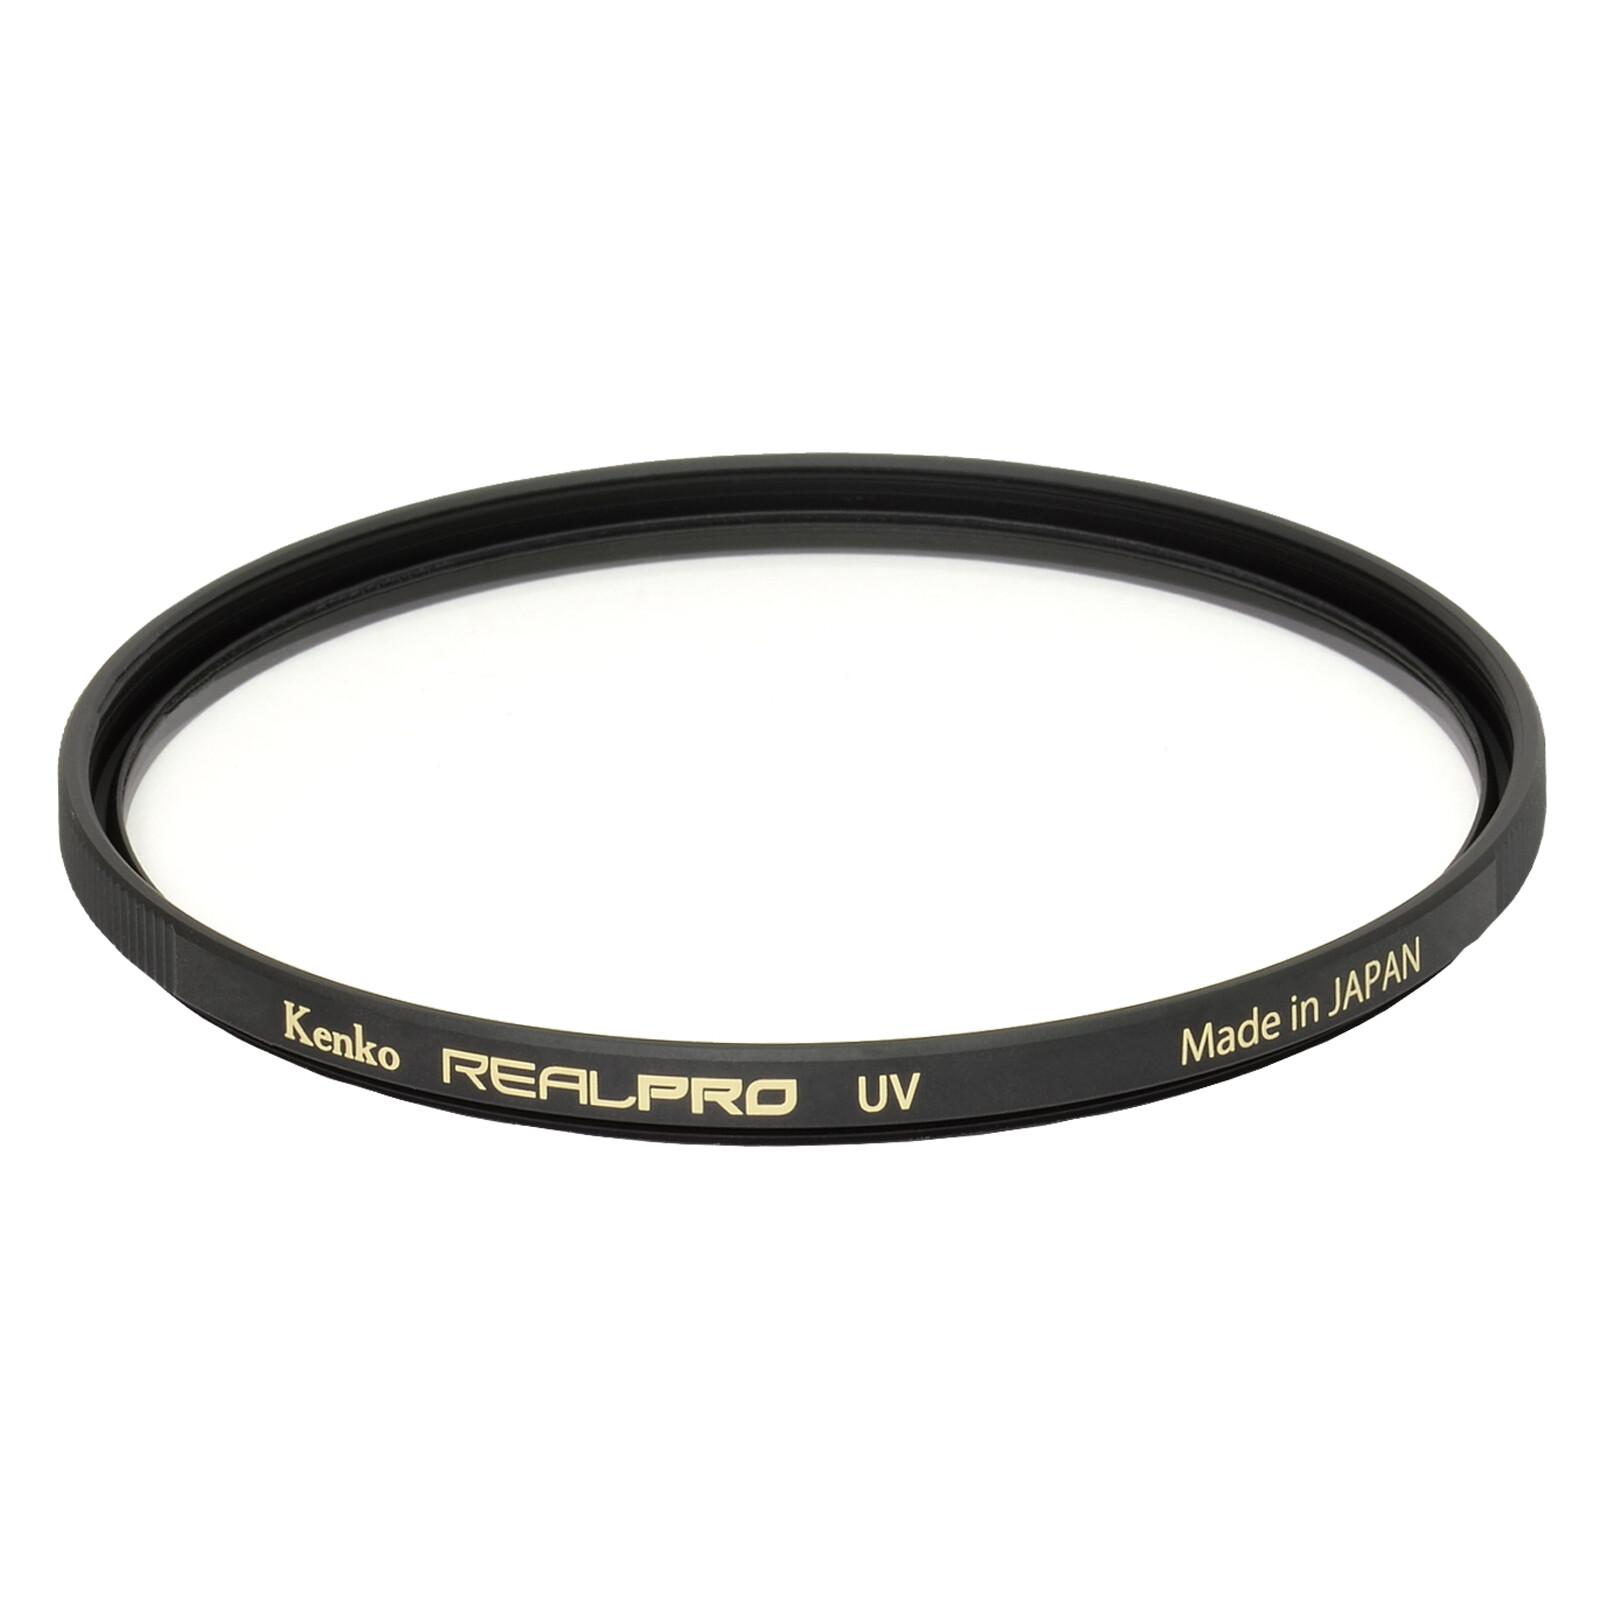 Kenko Real Pro UV 37mm Slim